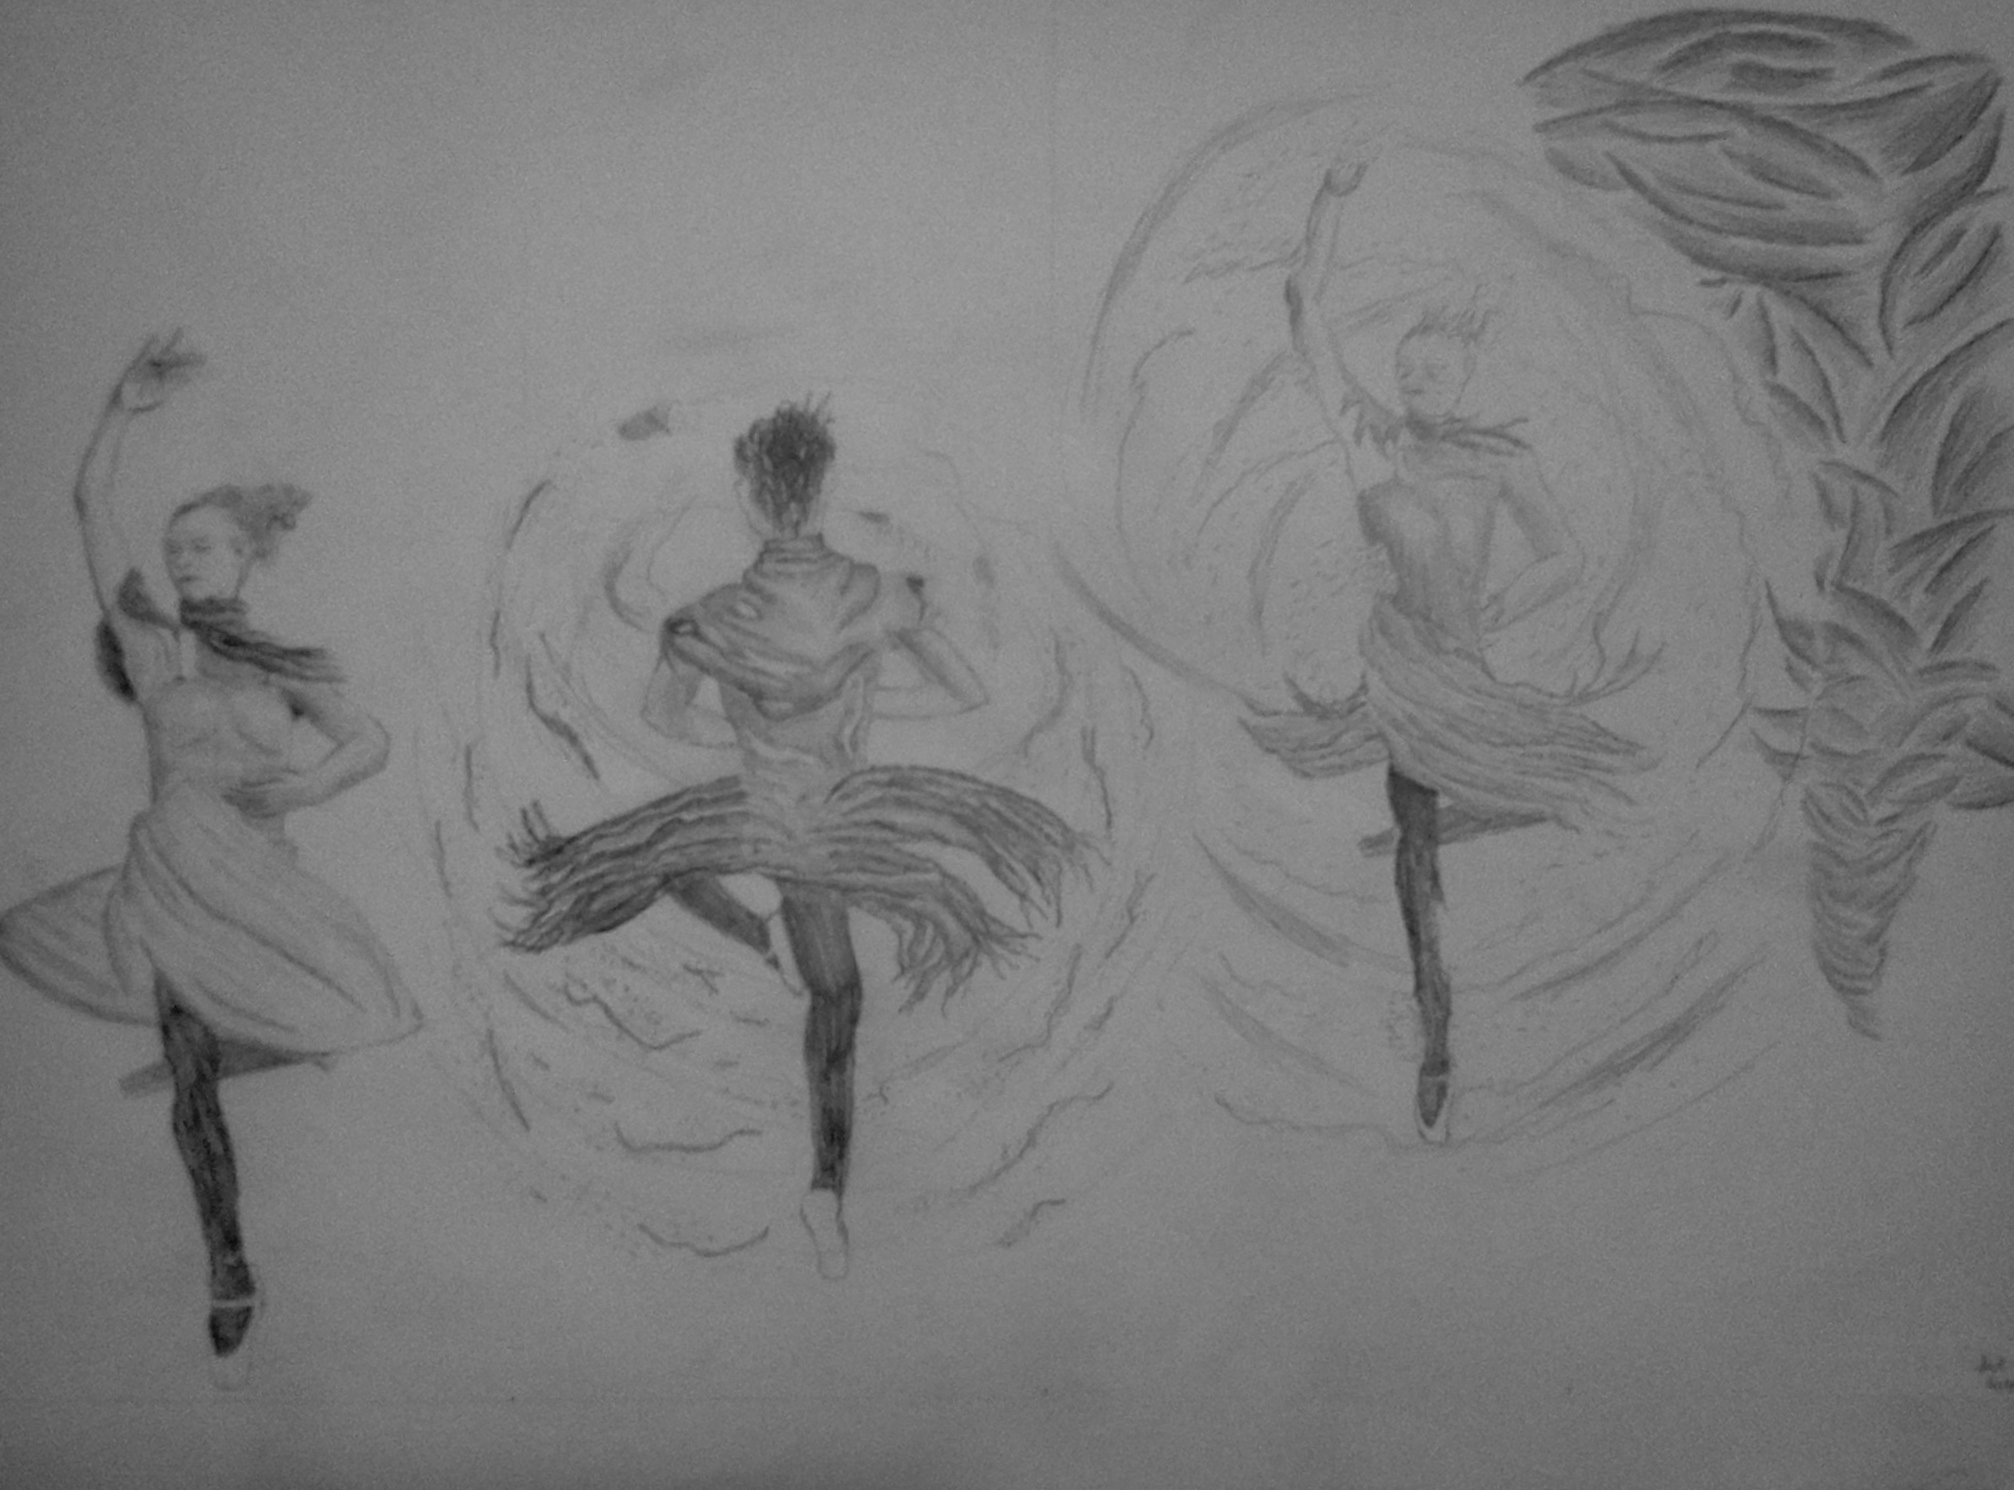 Dancer metamorphosis